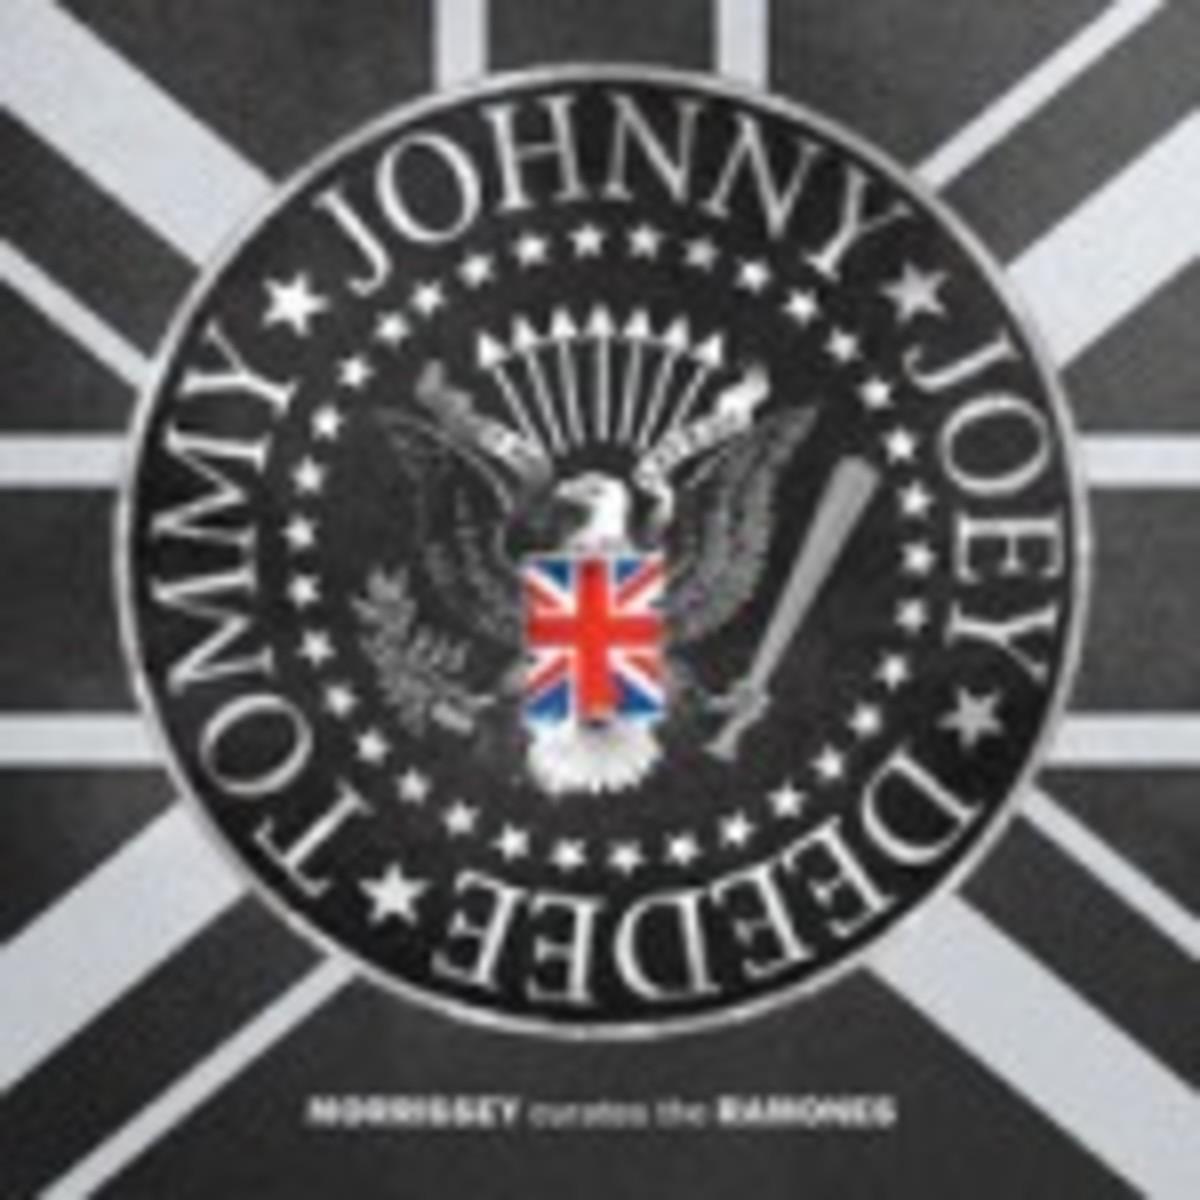 Morrisey Curates The Ramones on vinyl